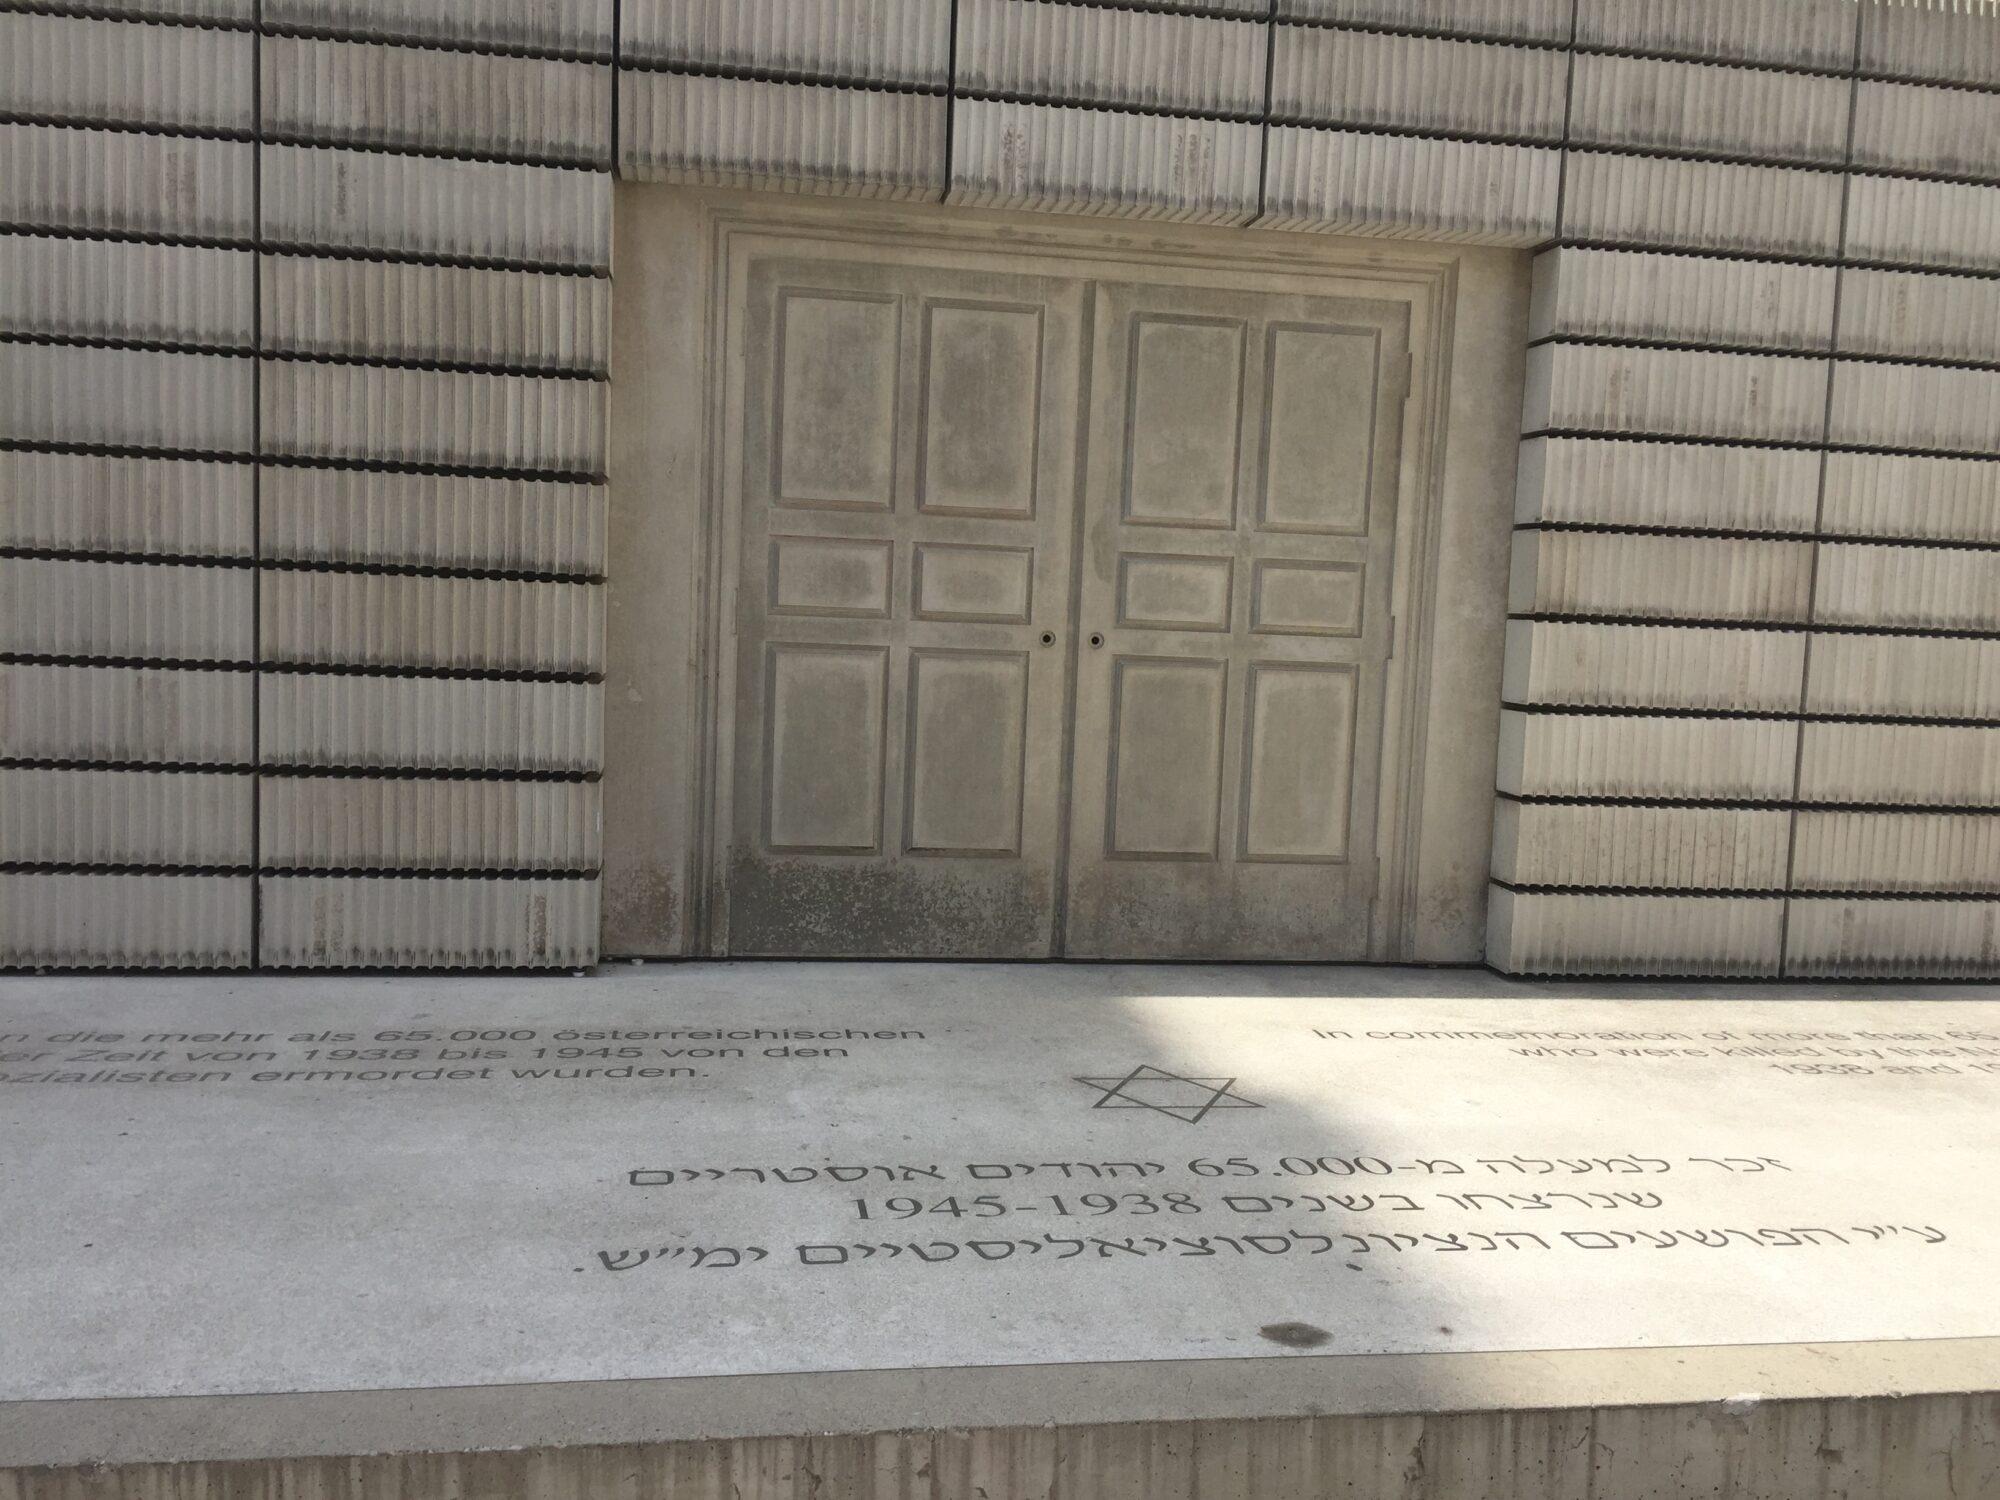 Stone Jewish memorial